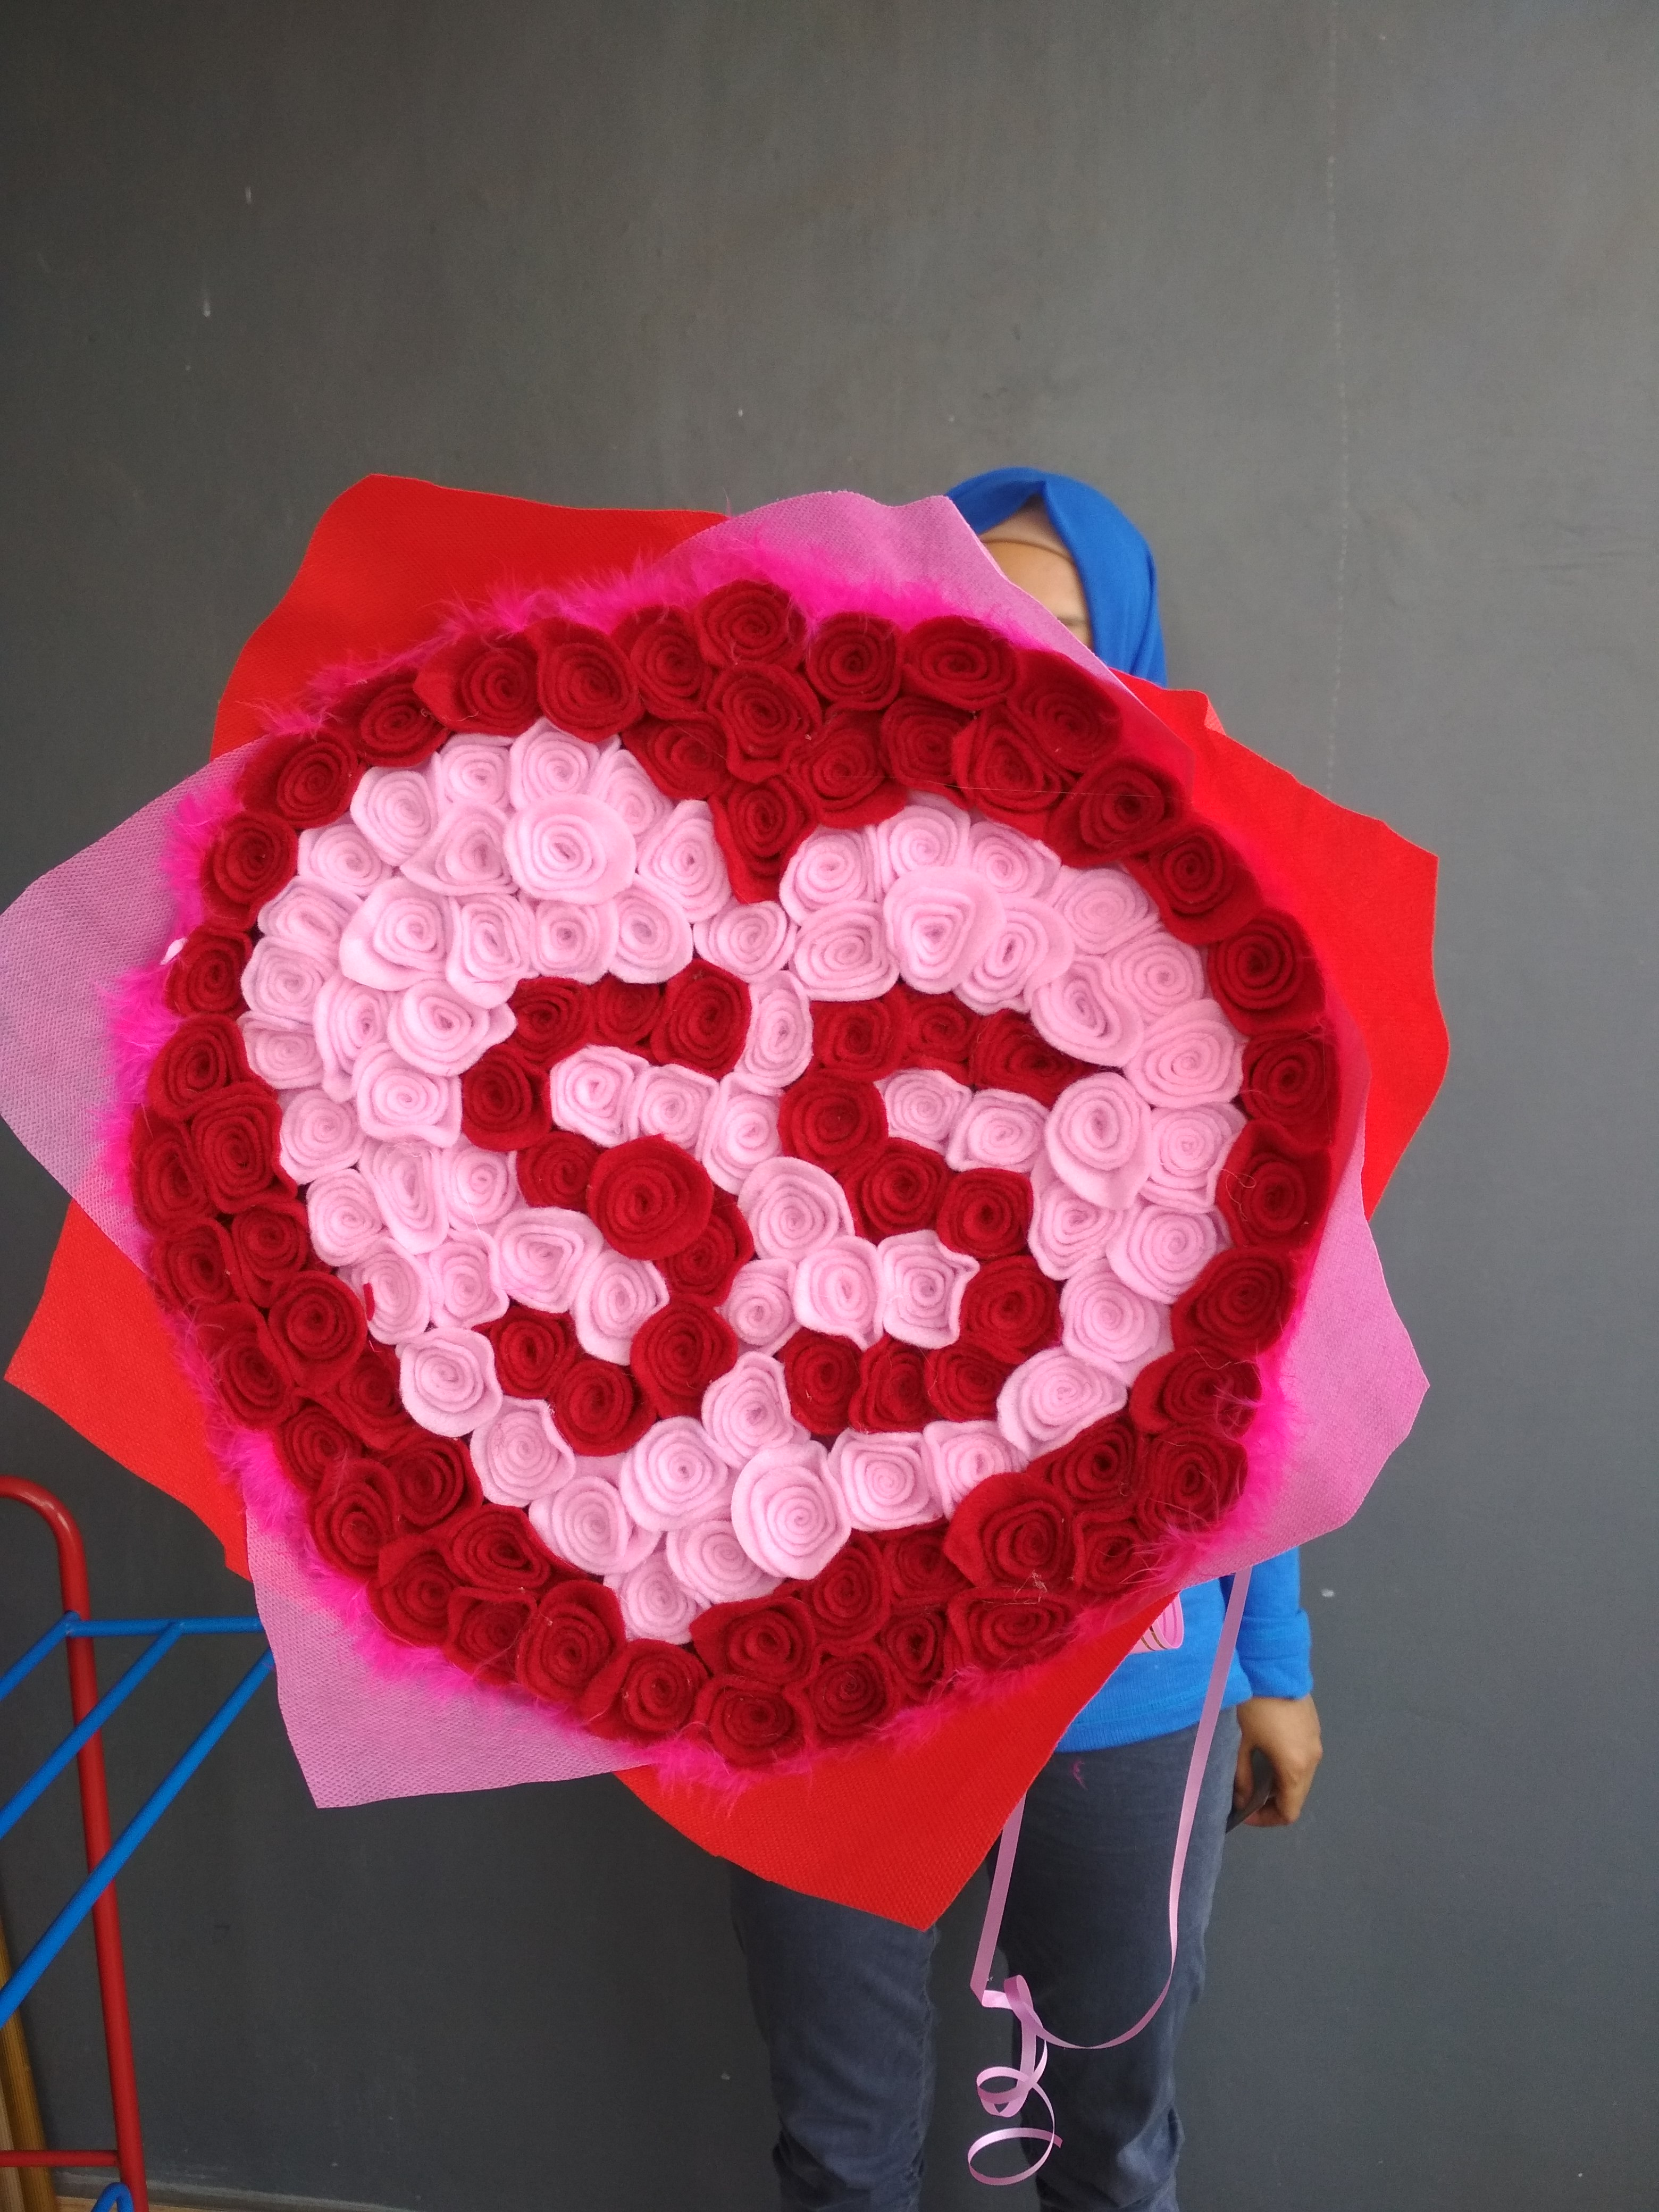 Distributor Buket Bunga Flanel Merah Wisuda Tamiang Layang